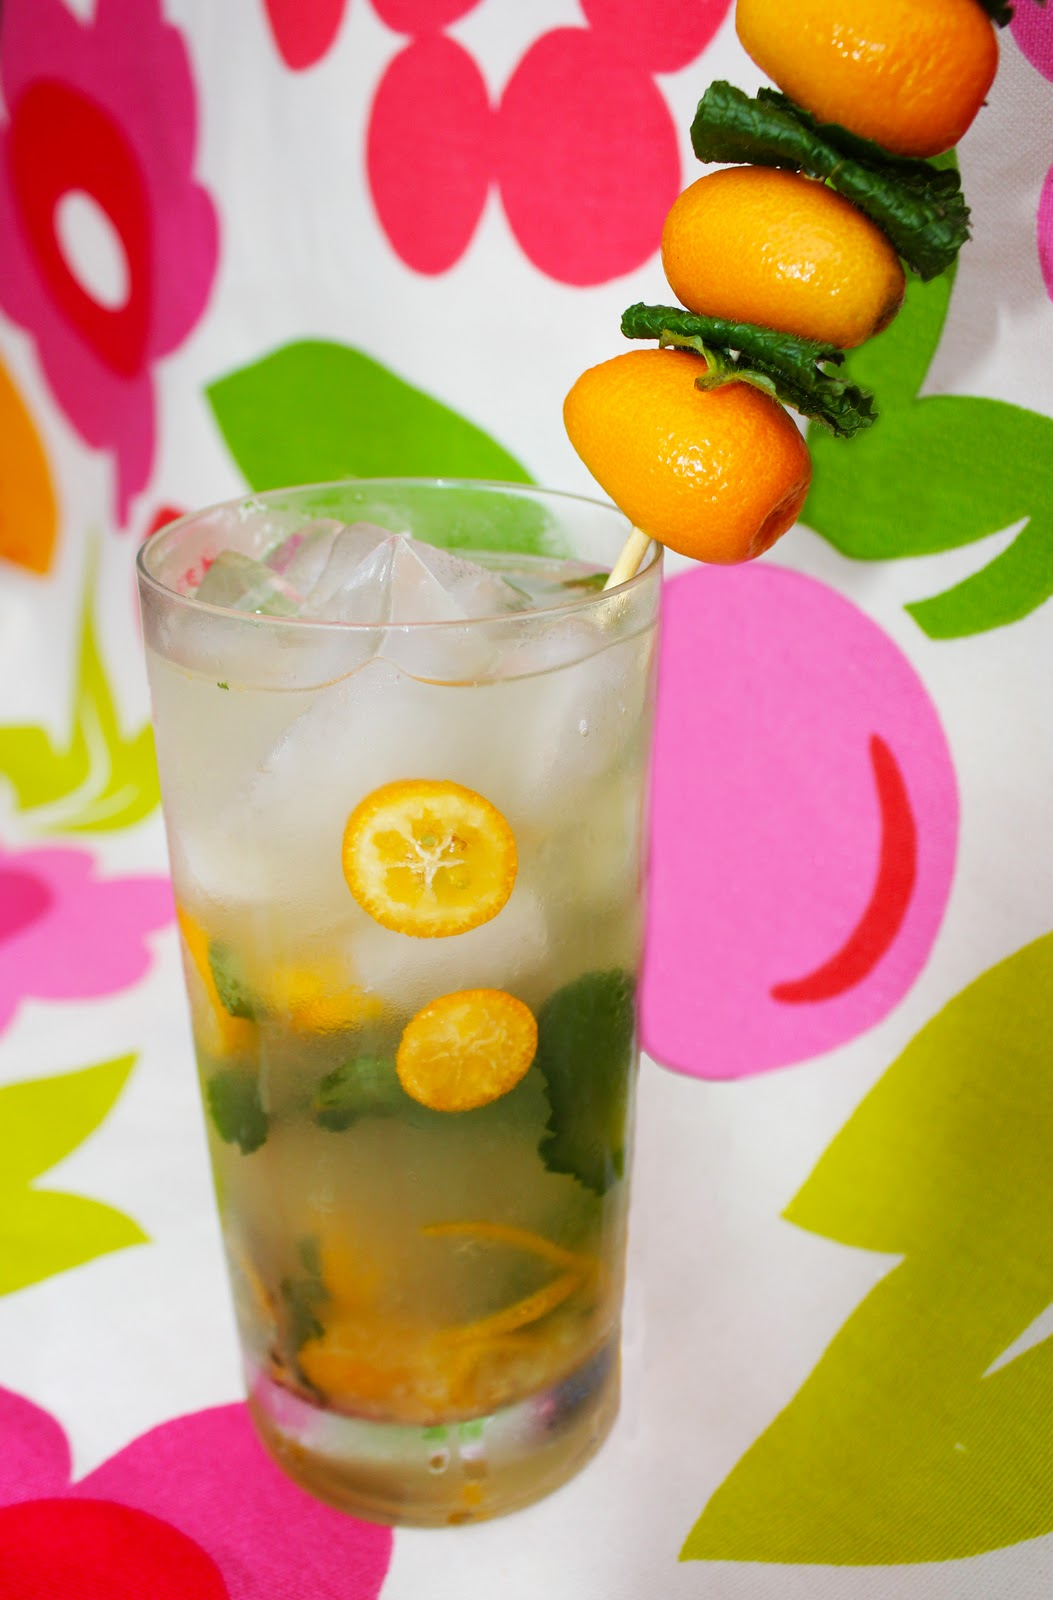 ... Bombed: Christmas Cocktail #7- Kumquat & Meyer Lemon Mojito